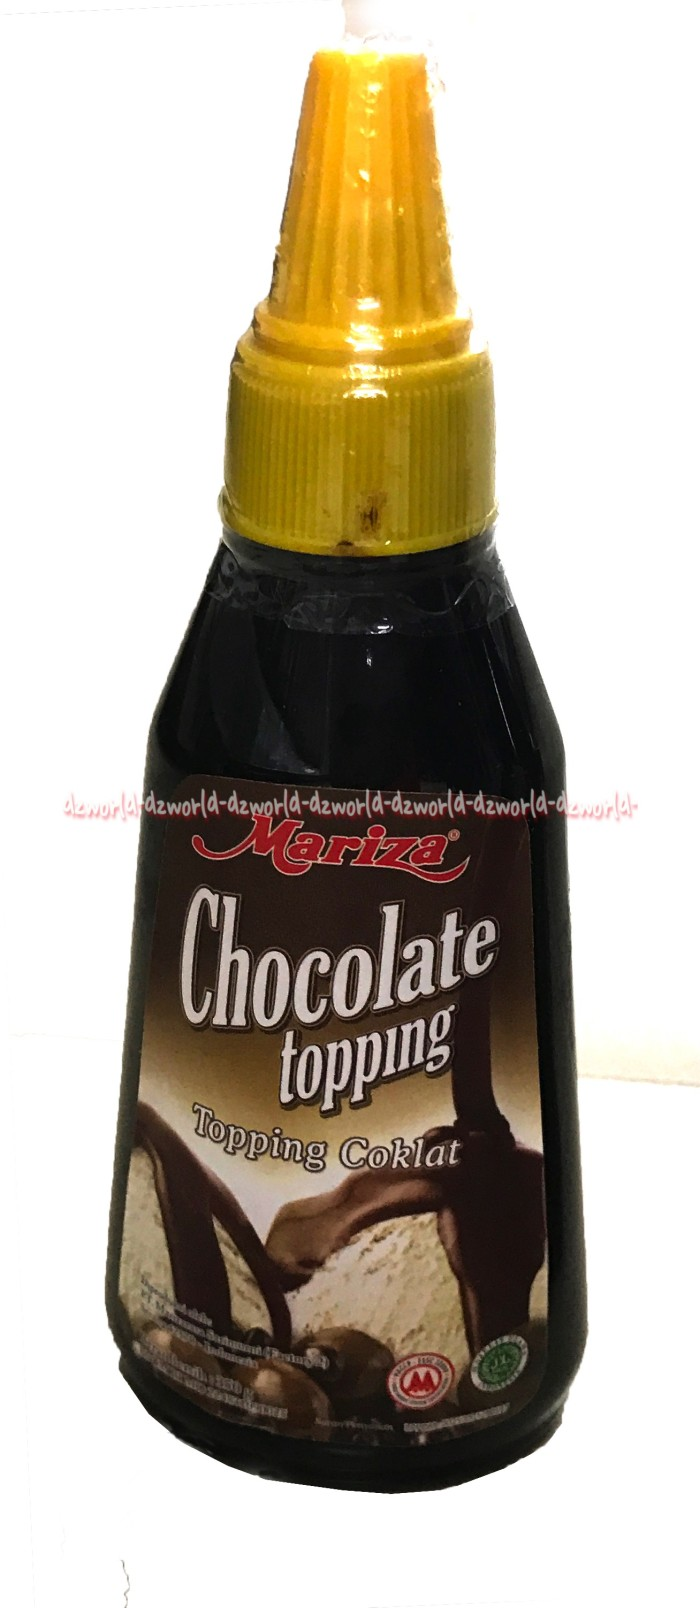 harga Mariza chocolate topping bisa dipadukan buat makanan atau minuman 350g Tokopedia.com